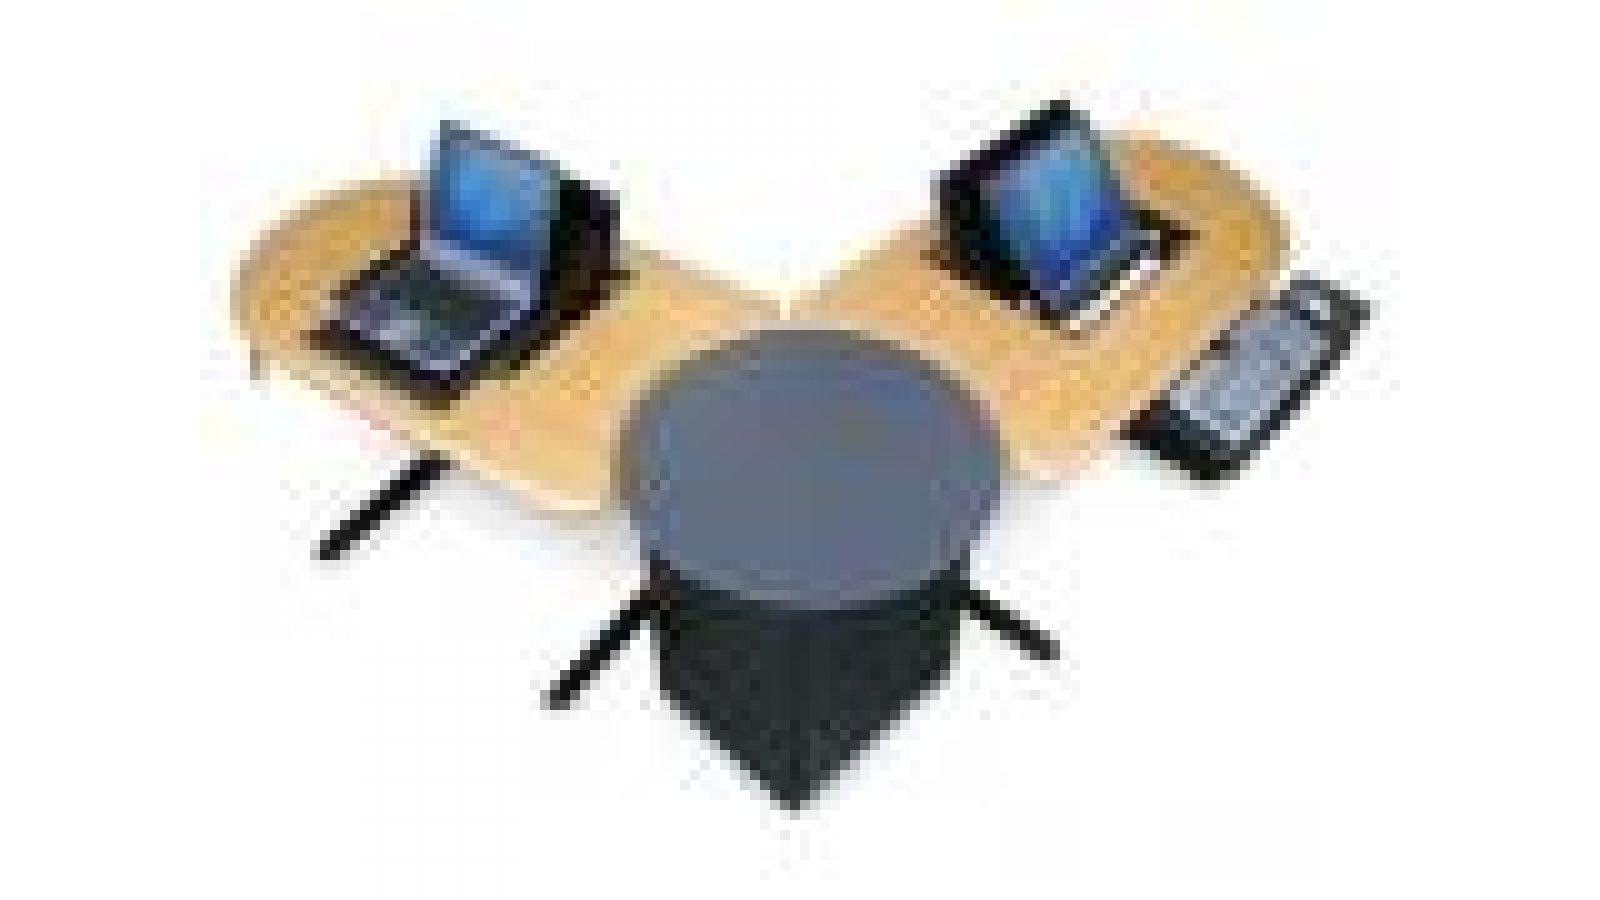 Pi¢â€ž¢ Computer Tables